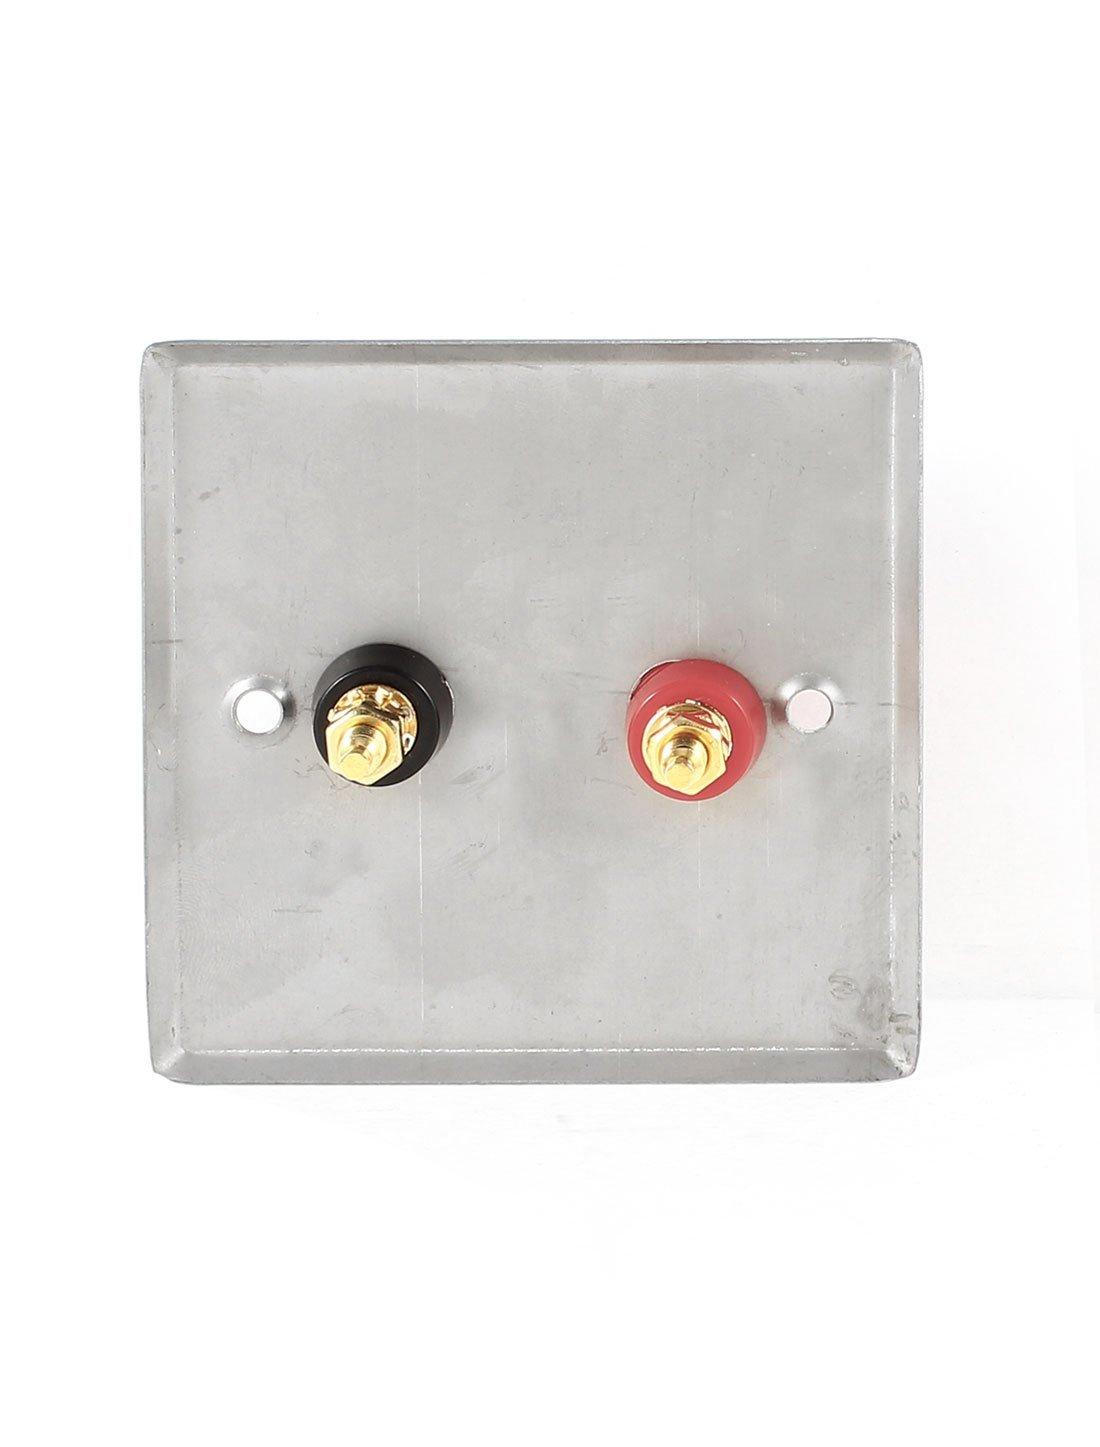 Amazon.com: eDealMax altavoz 2X Negro Rojo 6.35 cuarto Gato del zócalo de pared de Metal placa 85x85mm: Electronics